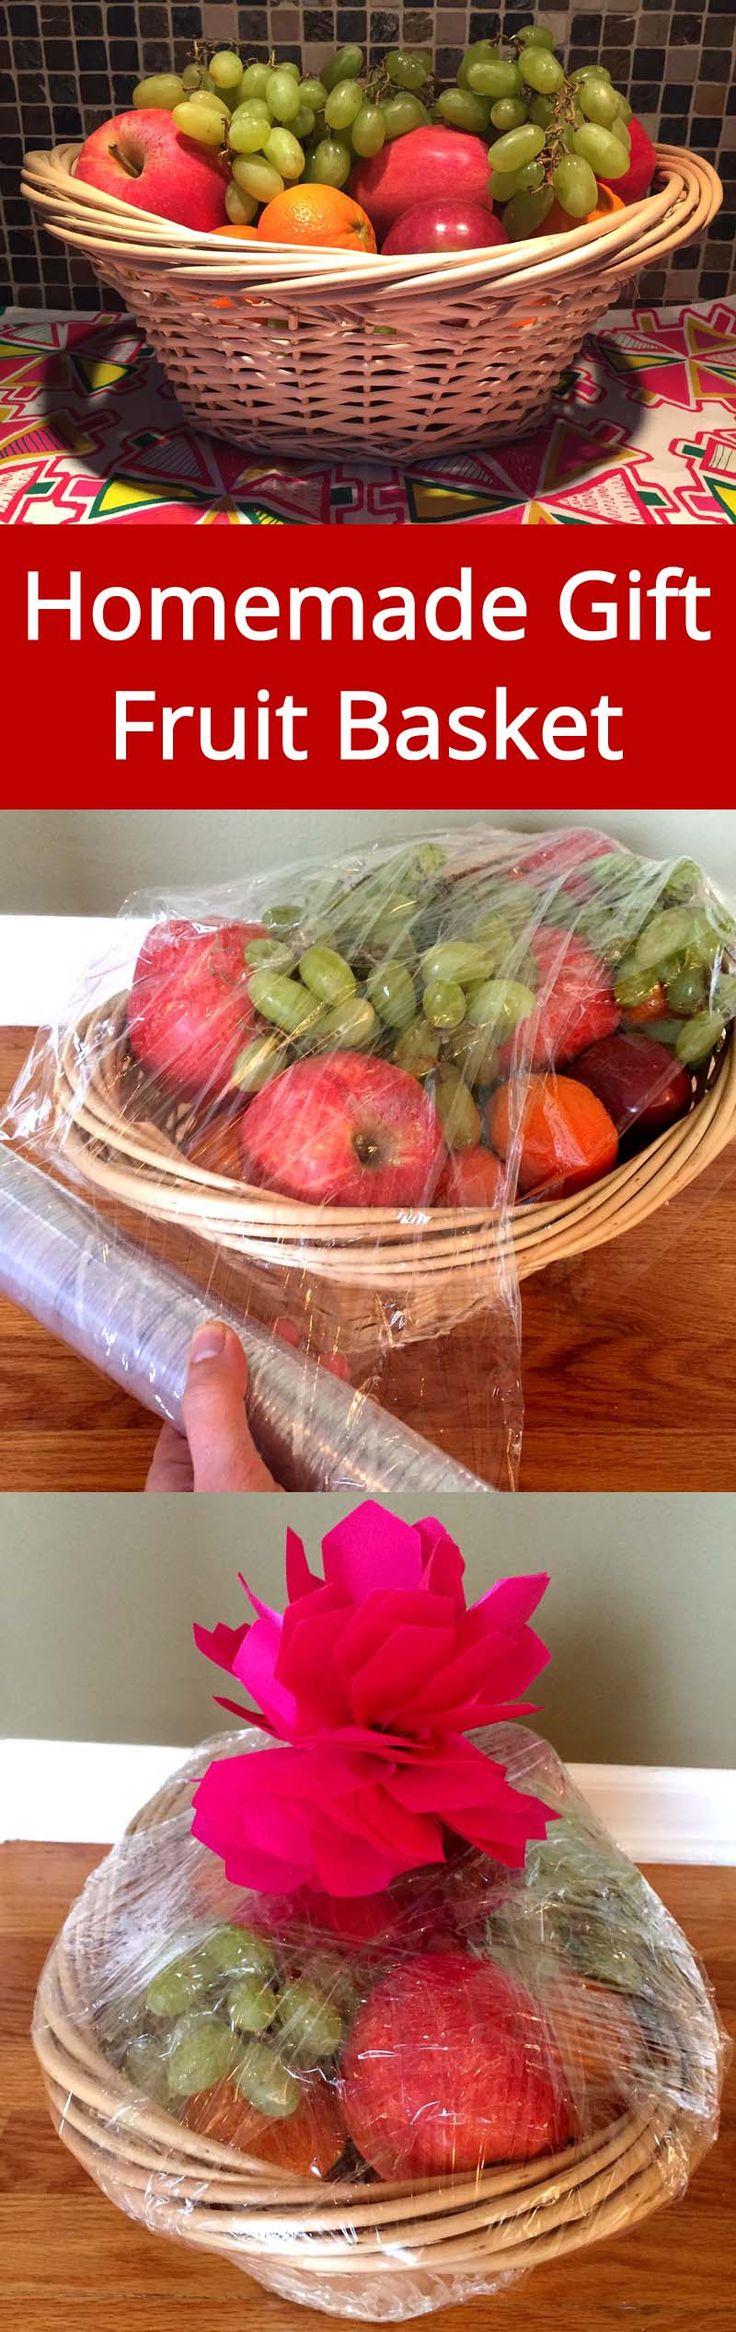 Best 25+ Christmas fruit ideas ideas on Pinterest ...